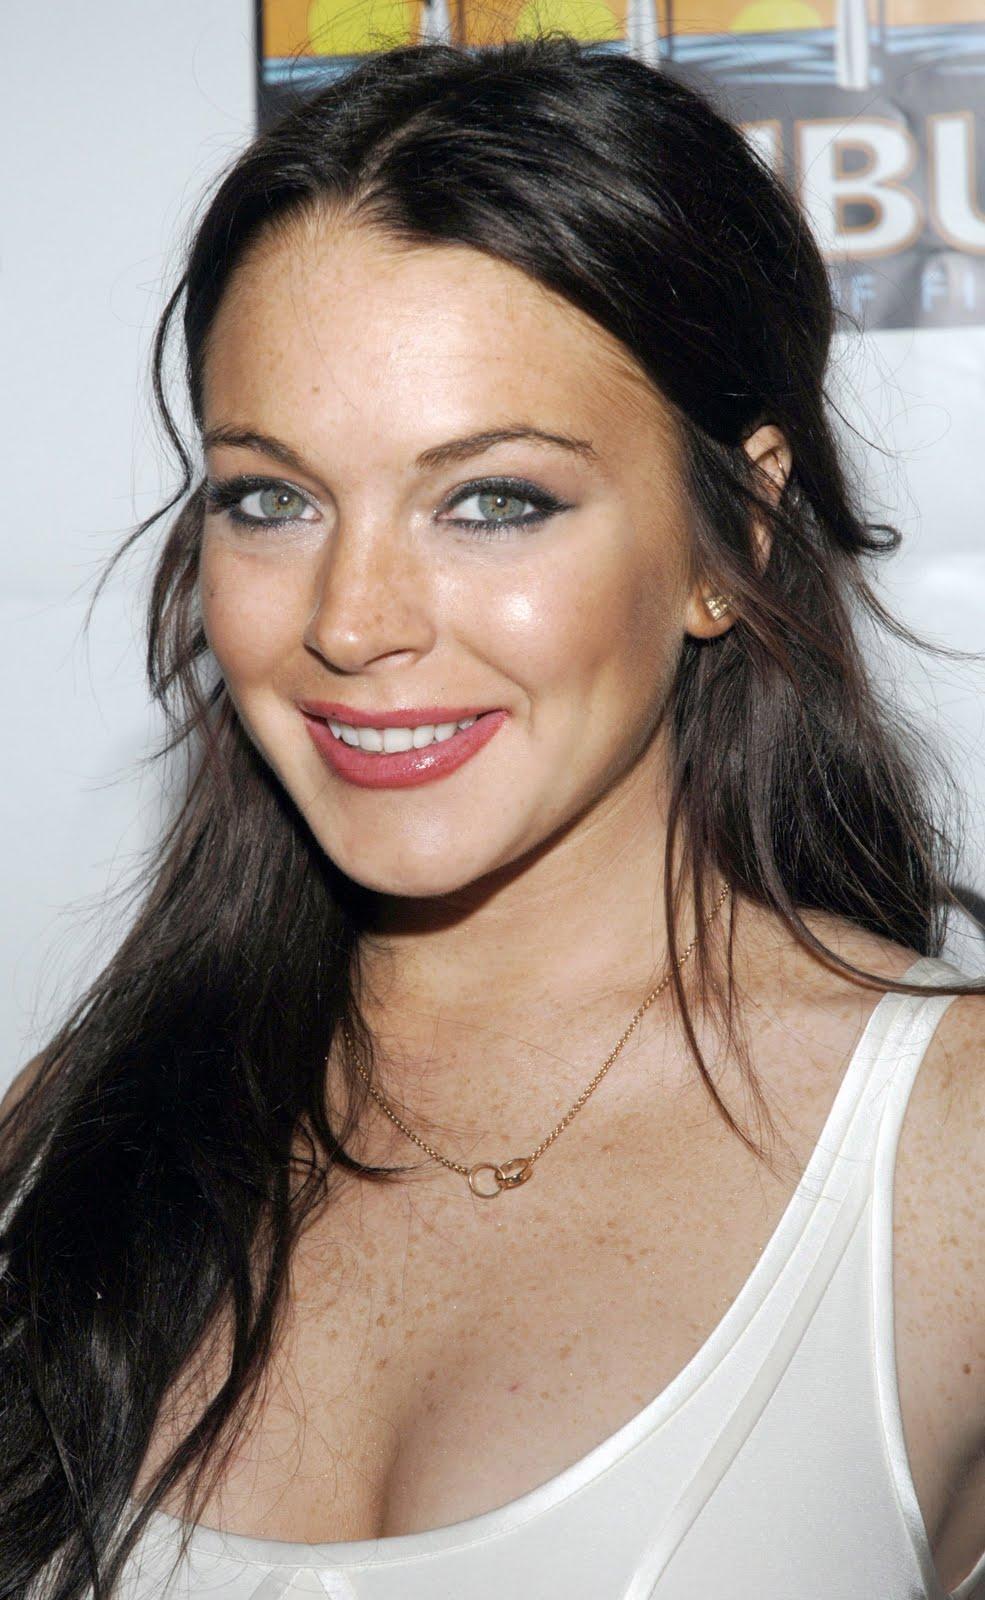 grthitz: Lindsay Lohan